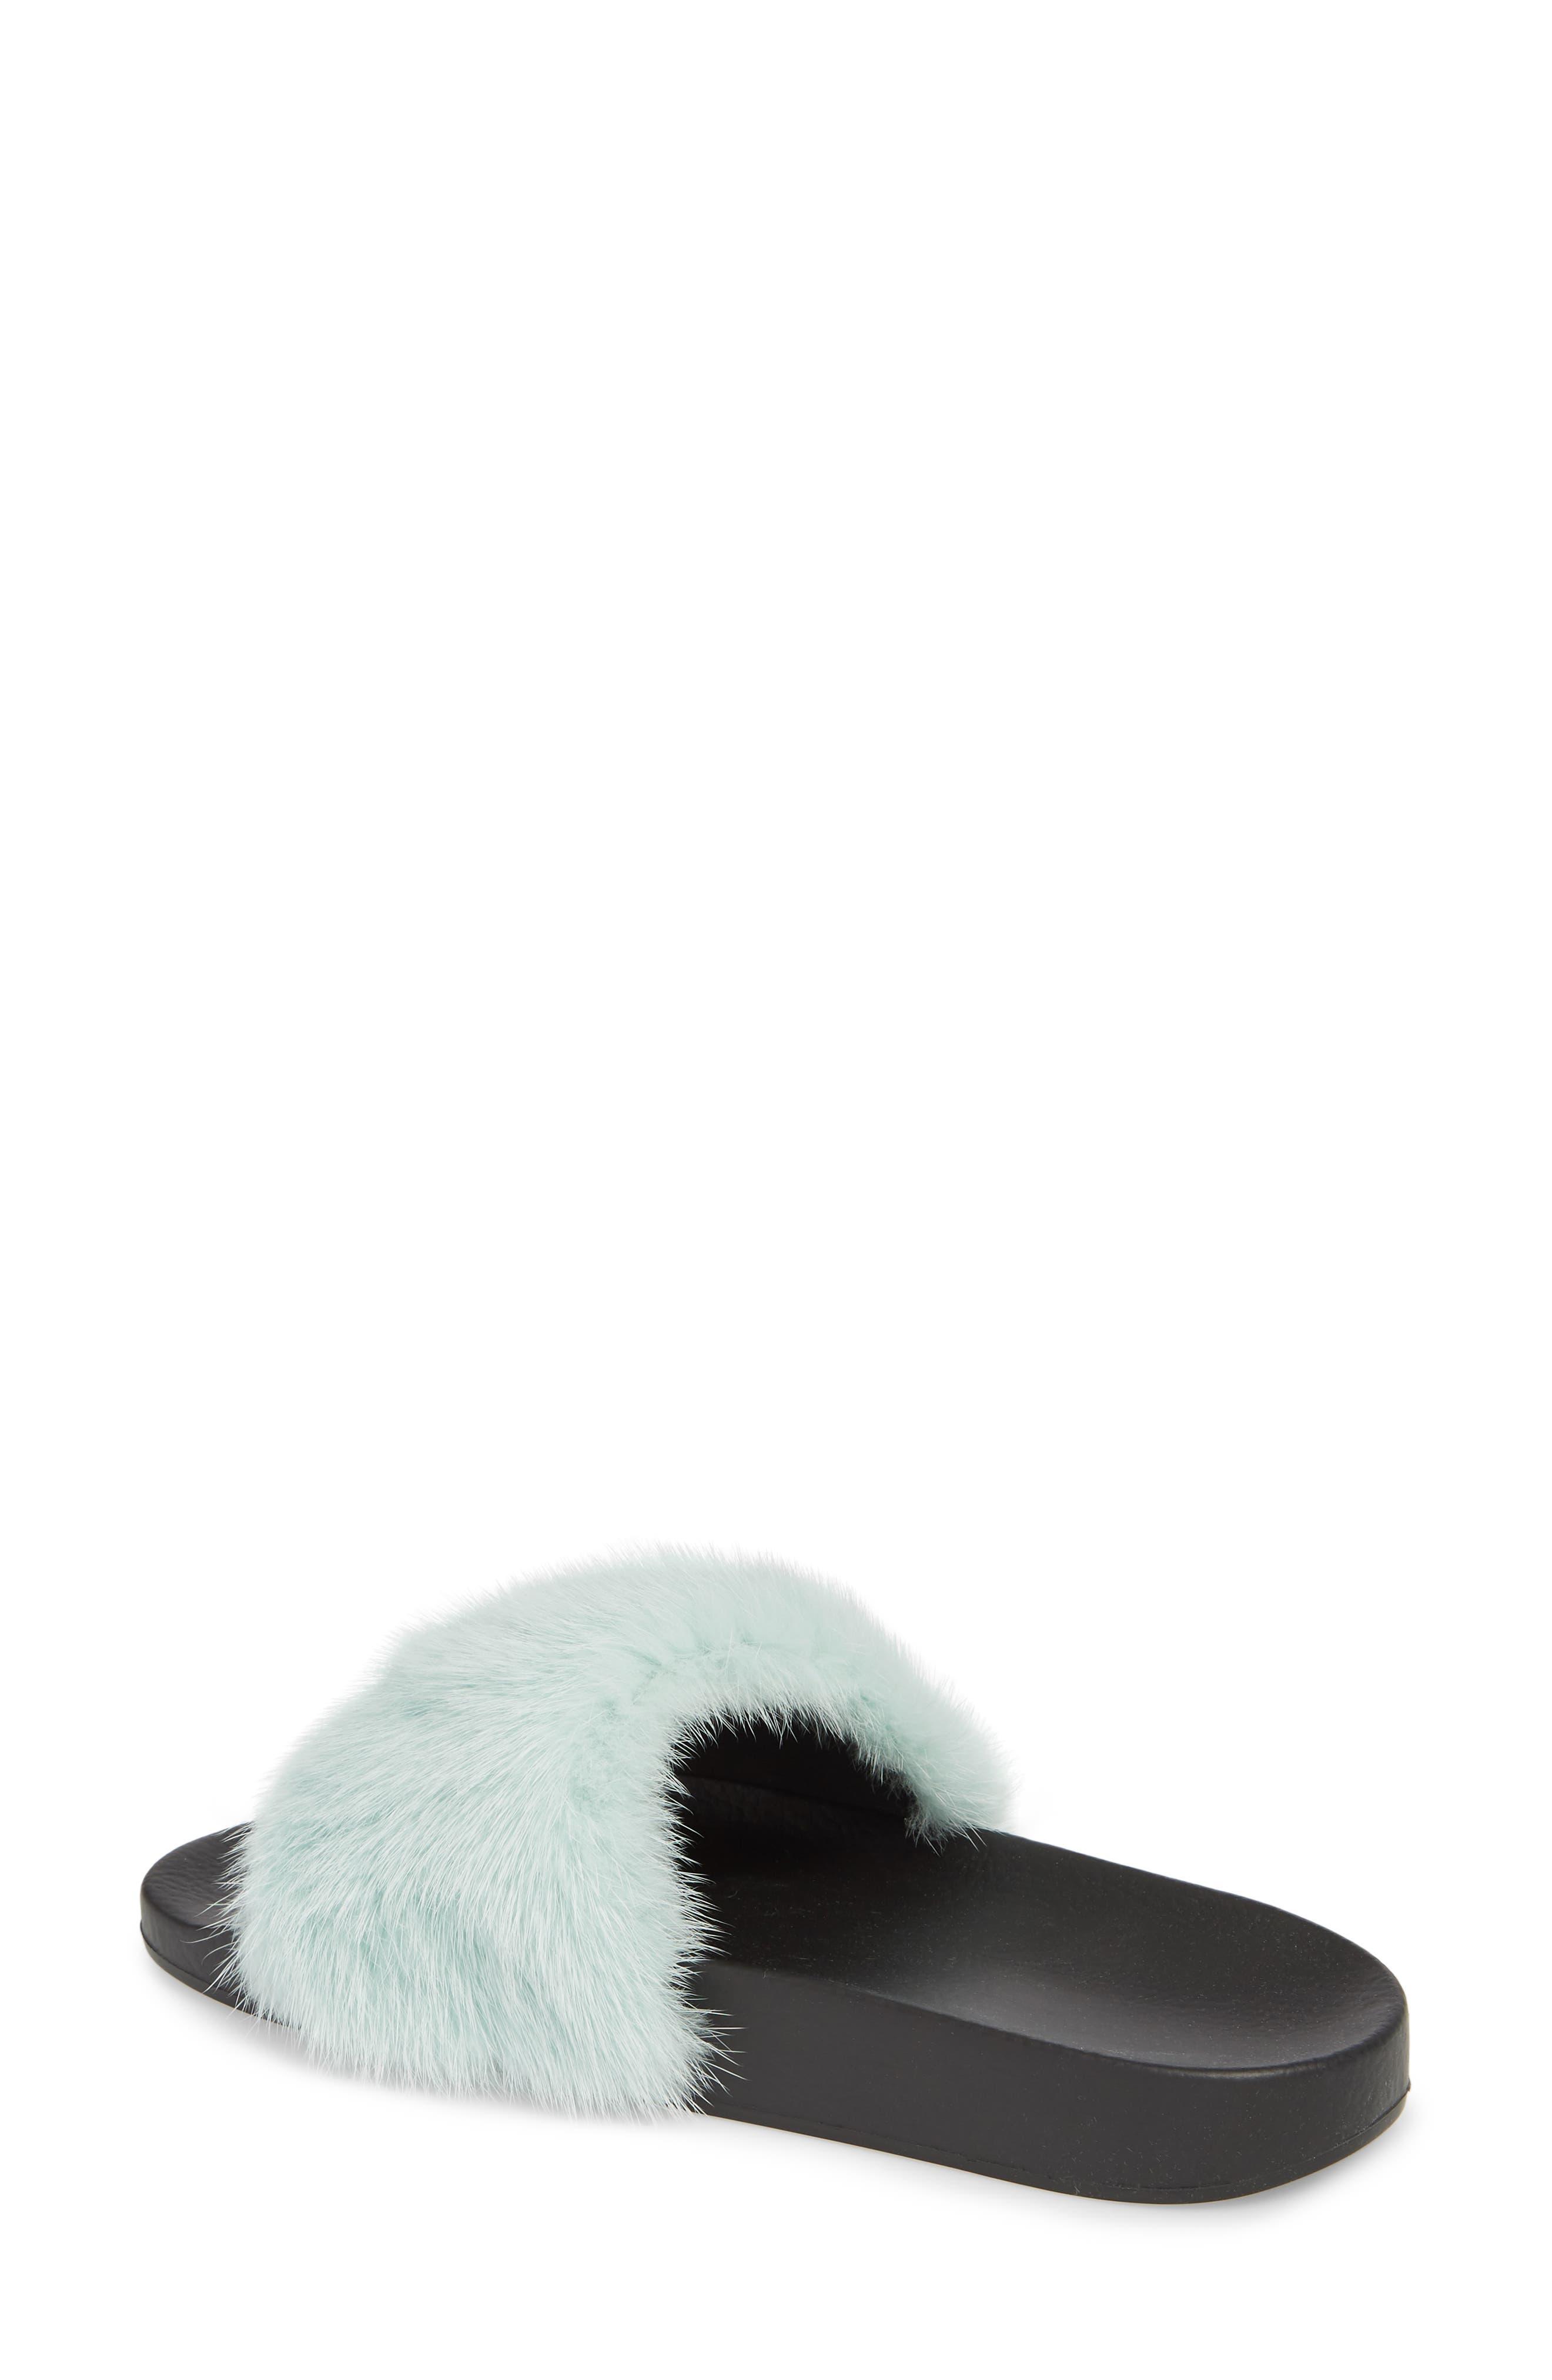 Genuine Mink Fur Slide Sandal,                             Alternate thumbnail 2, color,                             423